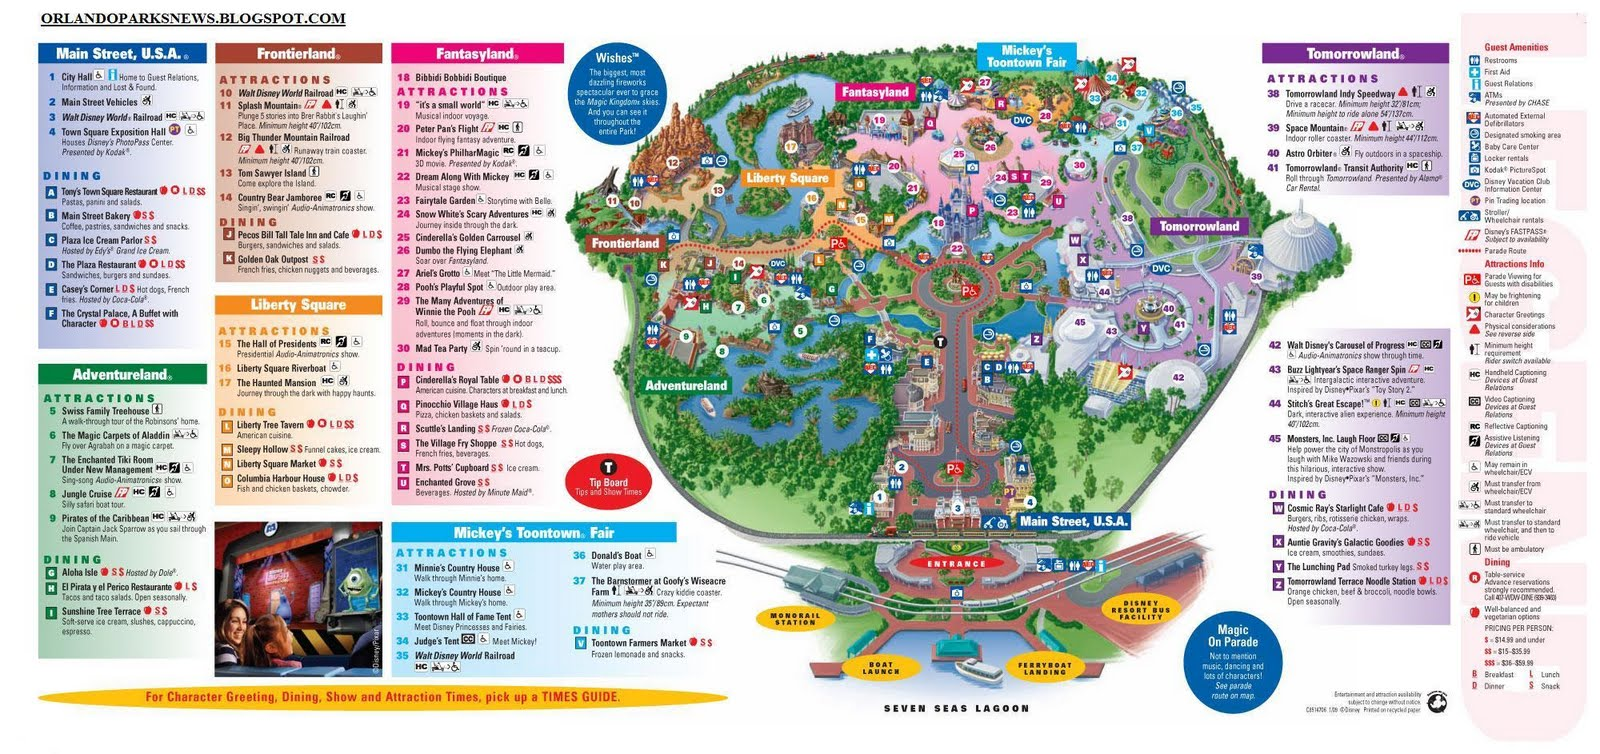 Magic Kingdom Map 2010 Magic Kingdom Guide Map 2010